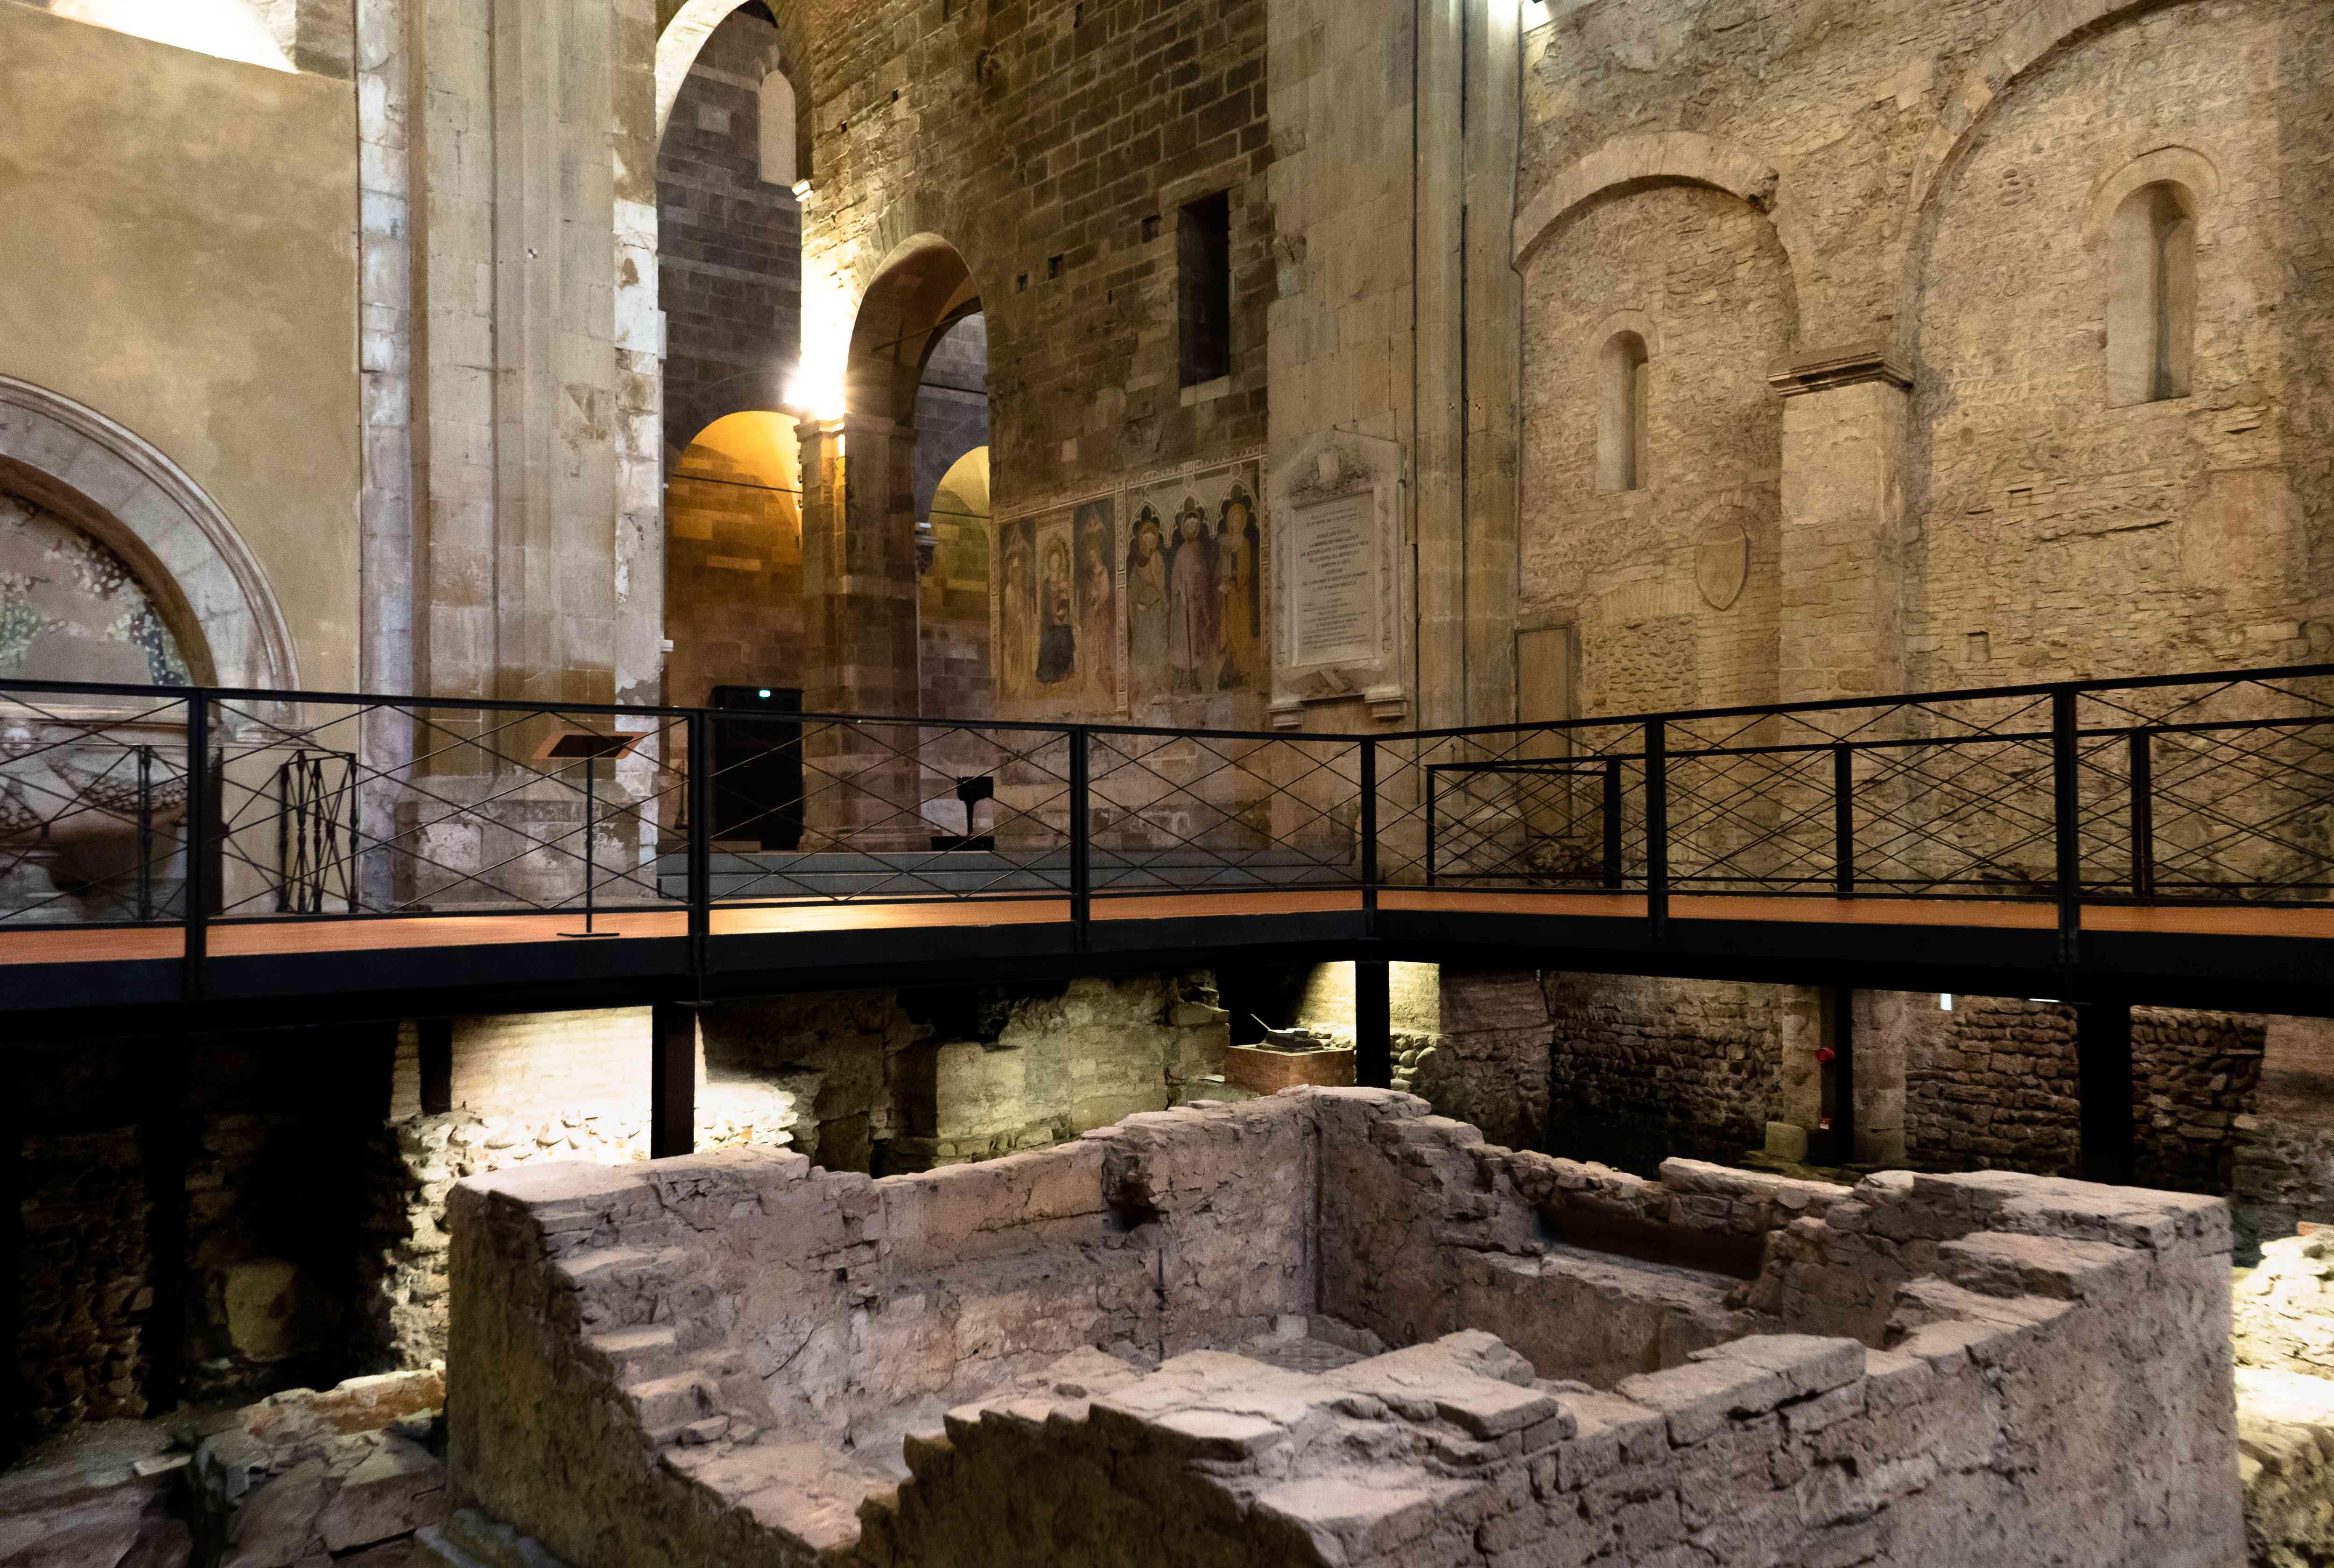 Ruins in the San Giovanni Church